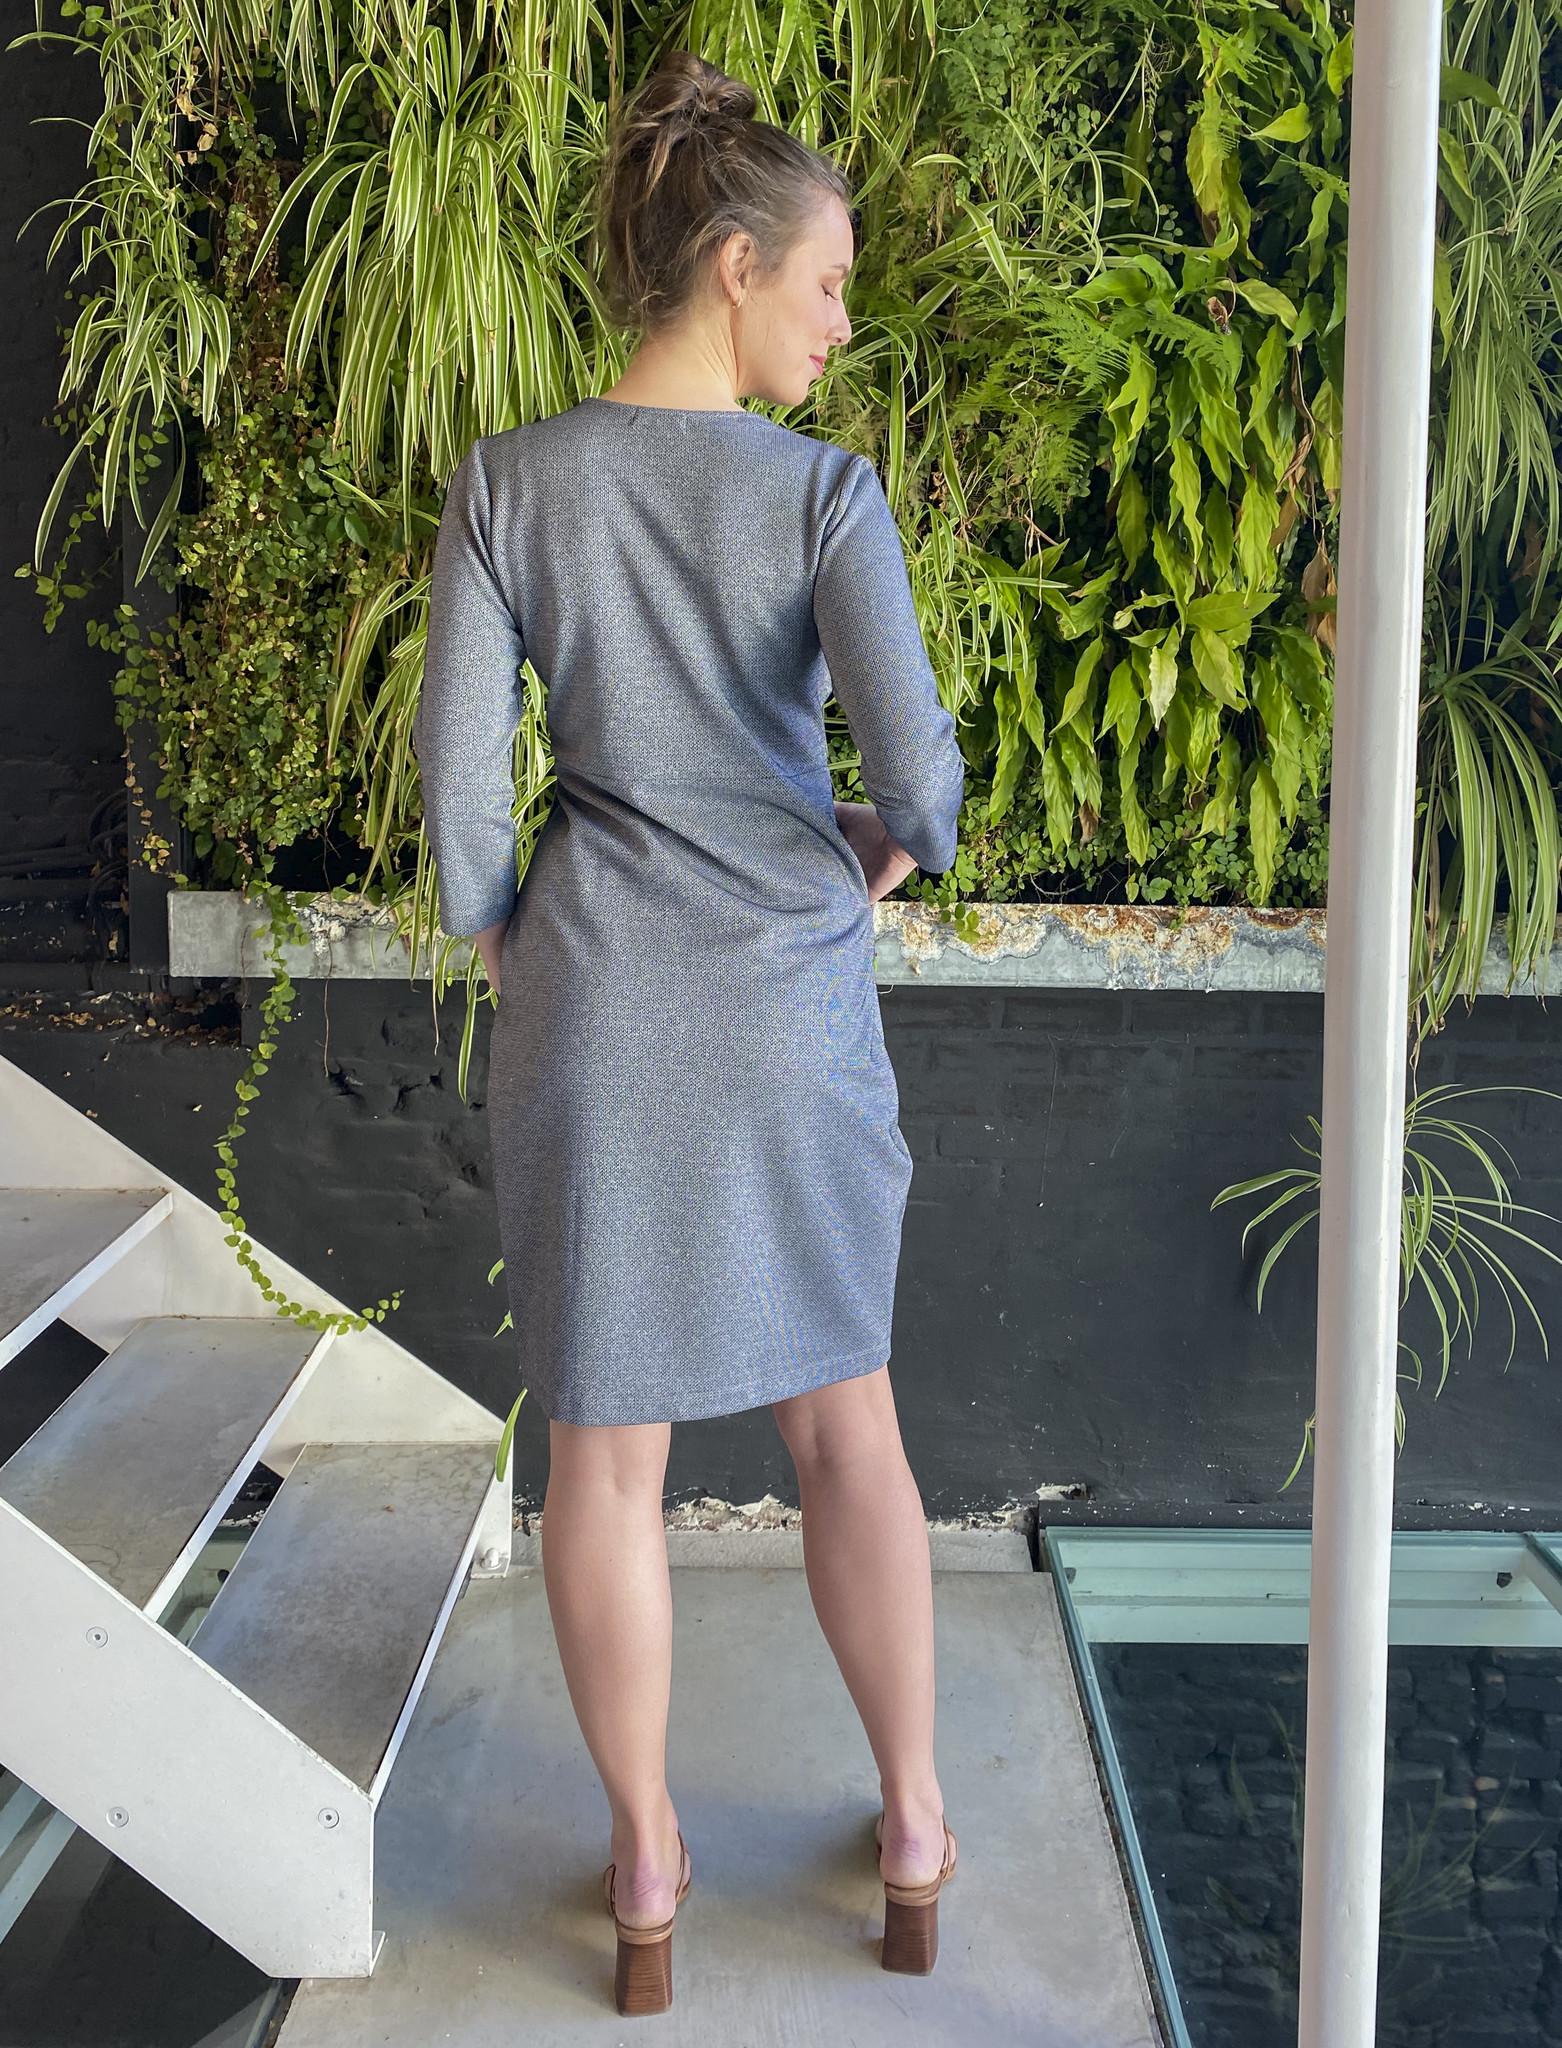 Comfy Dress 7/8 Sleeves Jeans Sparkle-3